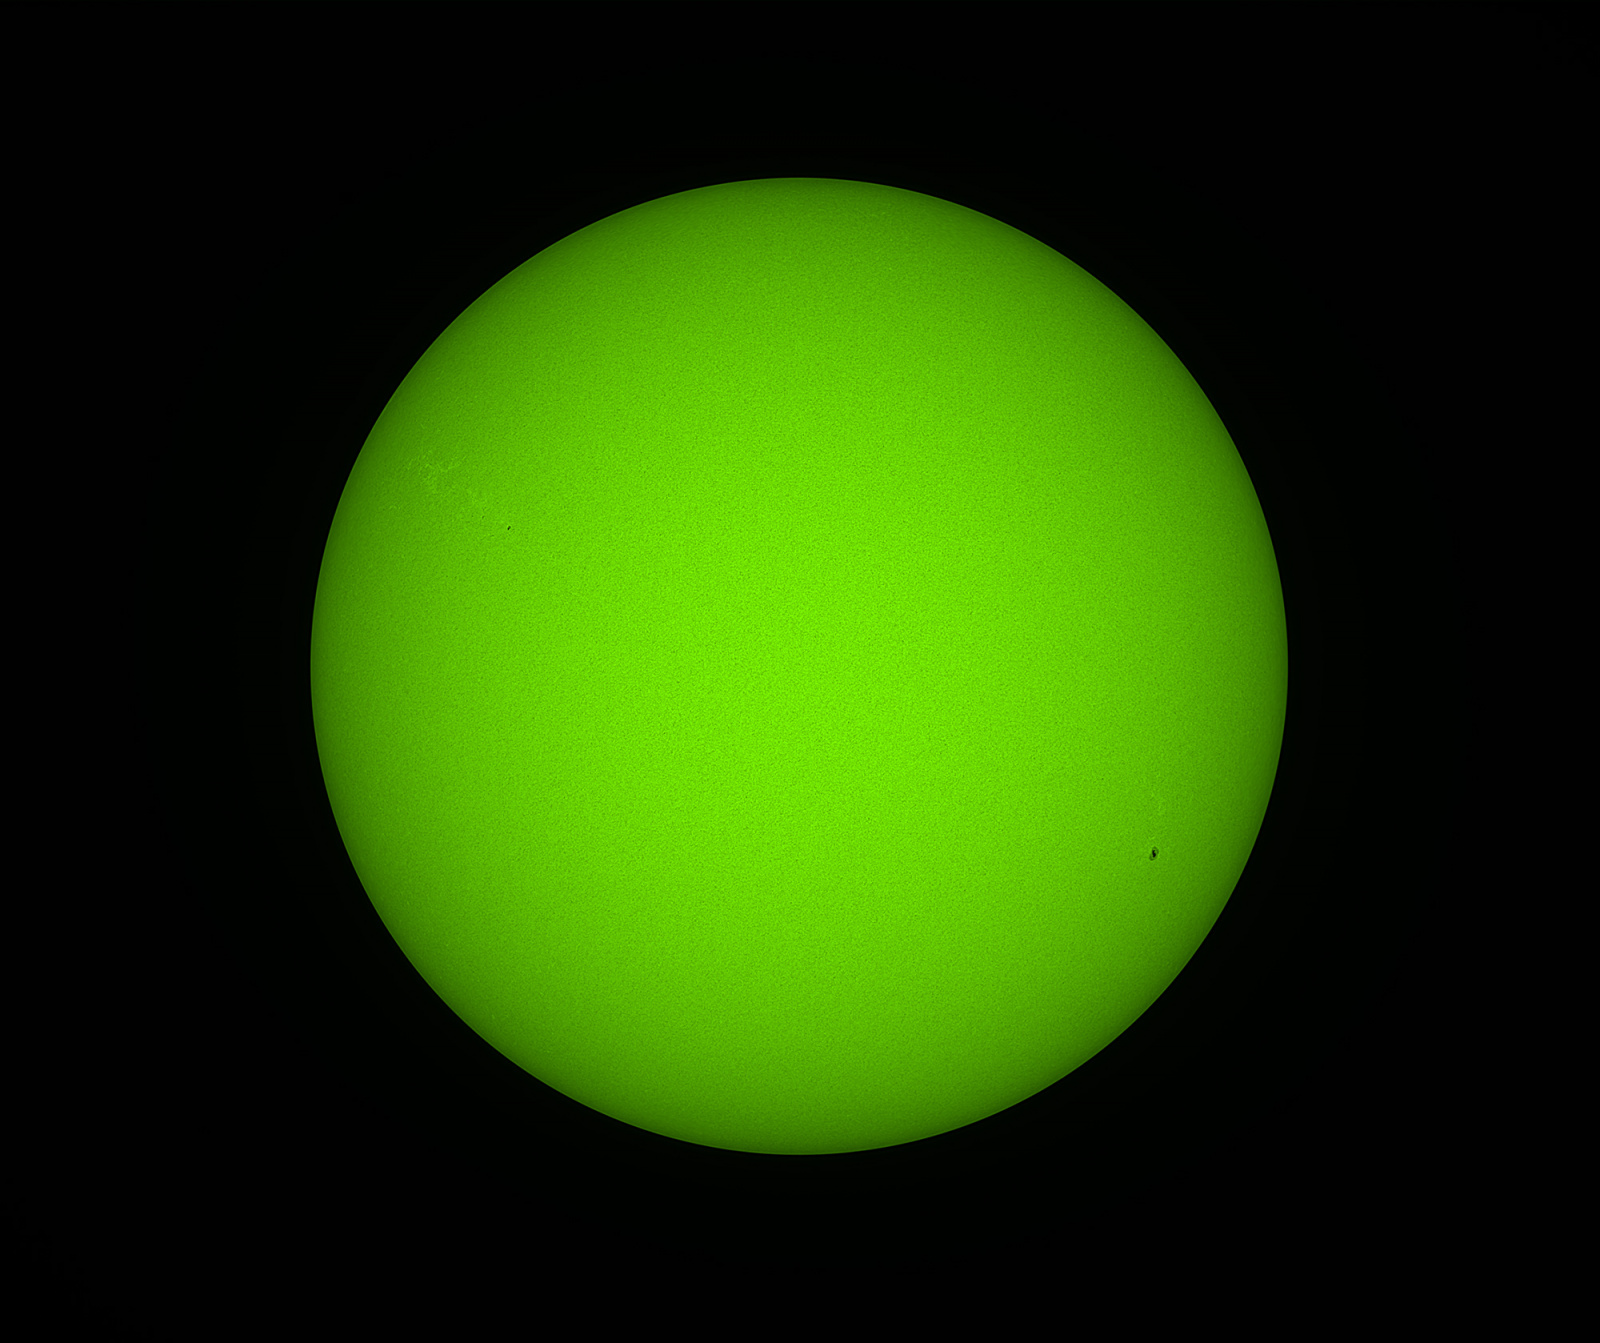 2020_07_31_0641_9_Sun_pipp_g4_ap103_Reg_PS.thumb.jpg.8ab93c1efc839fd6d37712f61e1337c2.jpg